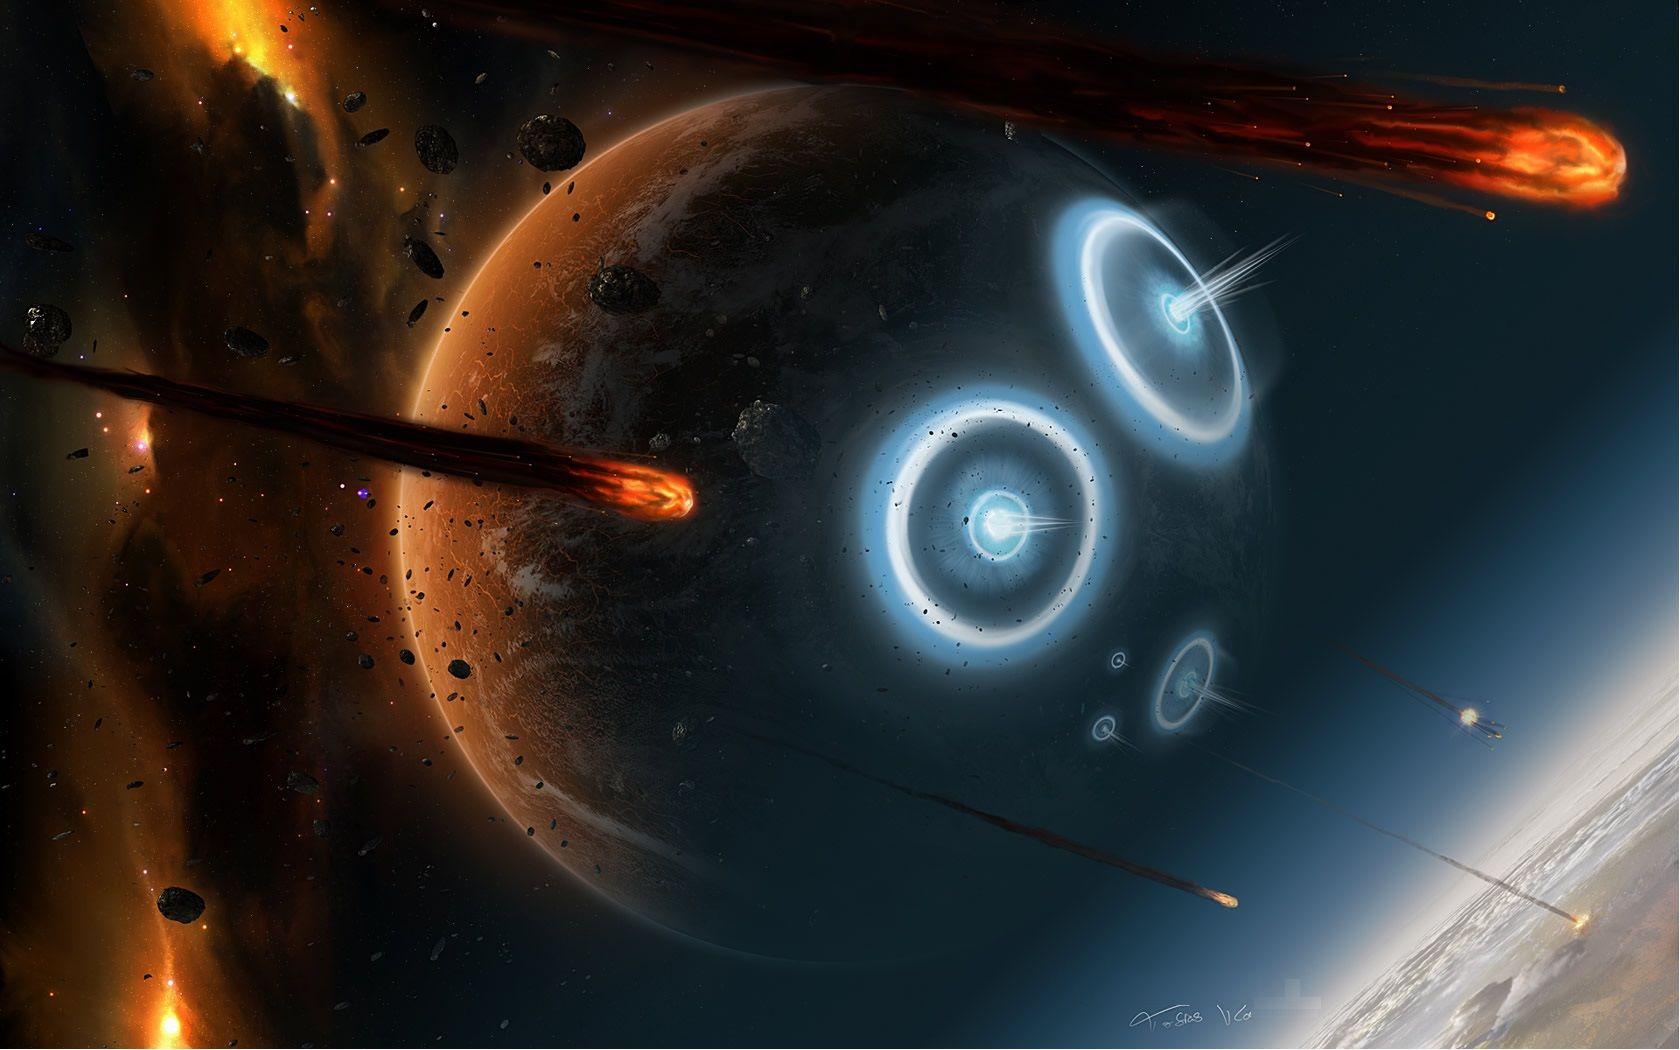 Epic Space Wallpaper In 2020 Space Artwork Sci Fi Wallpaper Wallpaper Space